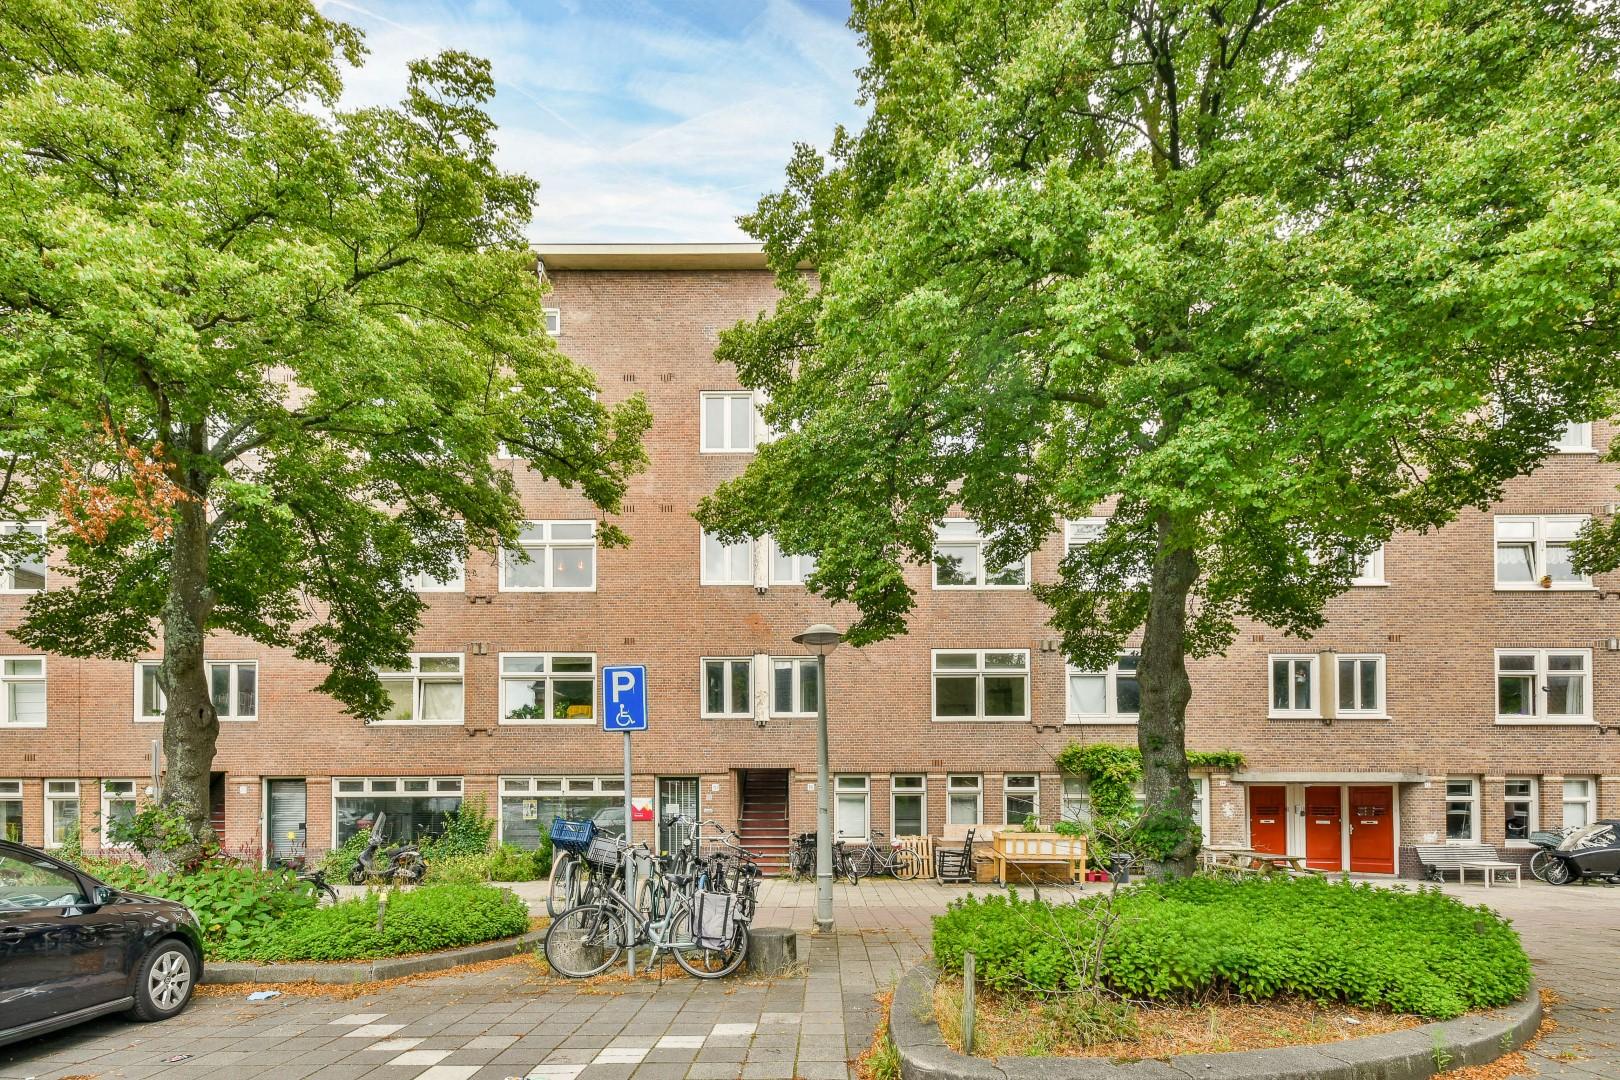 Magalhaensplein 16-I 1057 VG, Amsterdam, Noord-Holland Netherlands, 2 Slaapkamers Slaapkamers, ,1 BadkamerBadkamers,Appartement,Huur,Magalhaensplein 16-I,1,1575